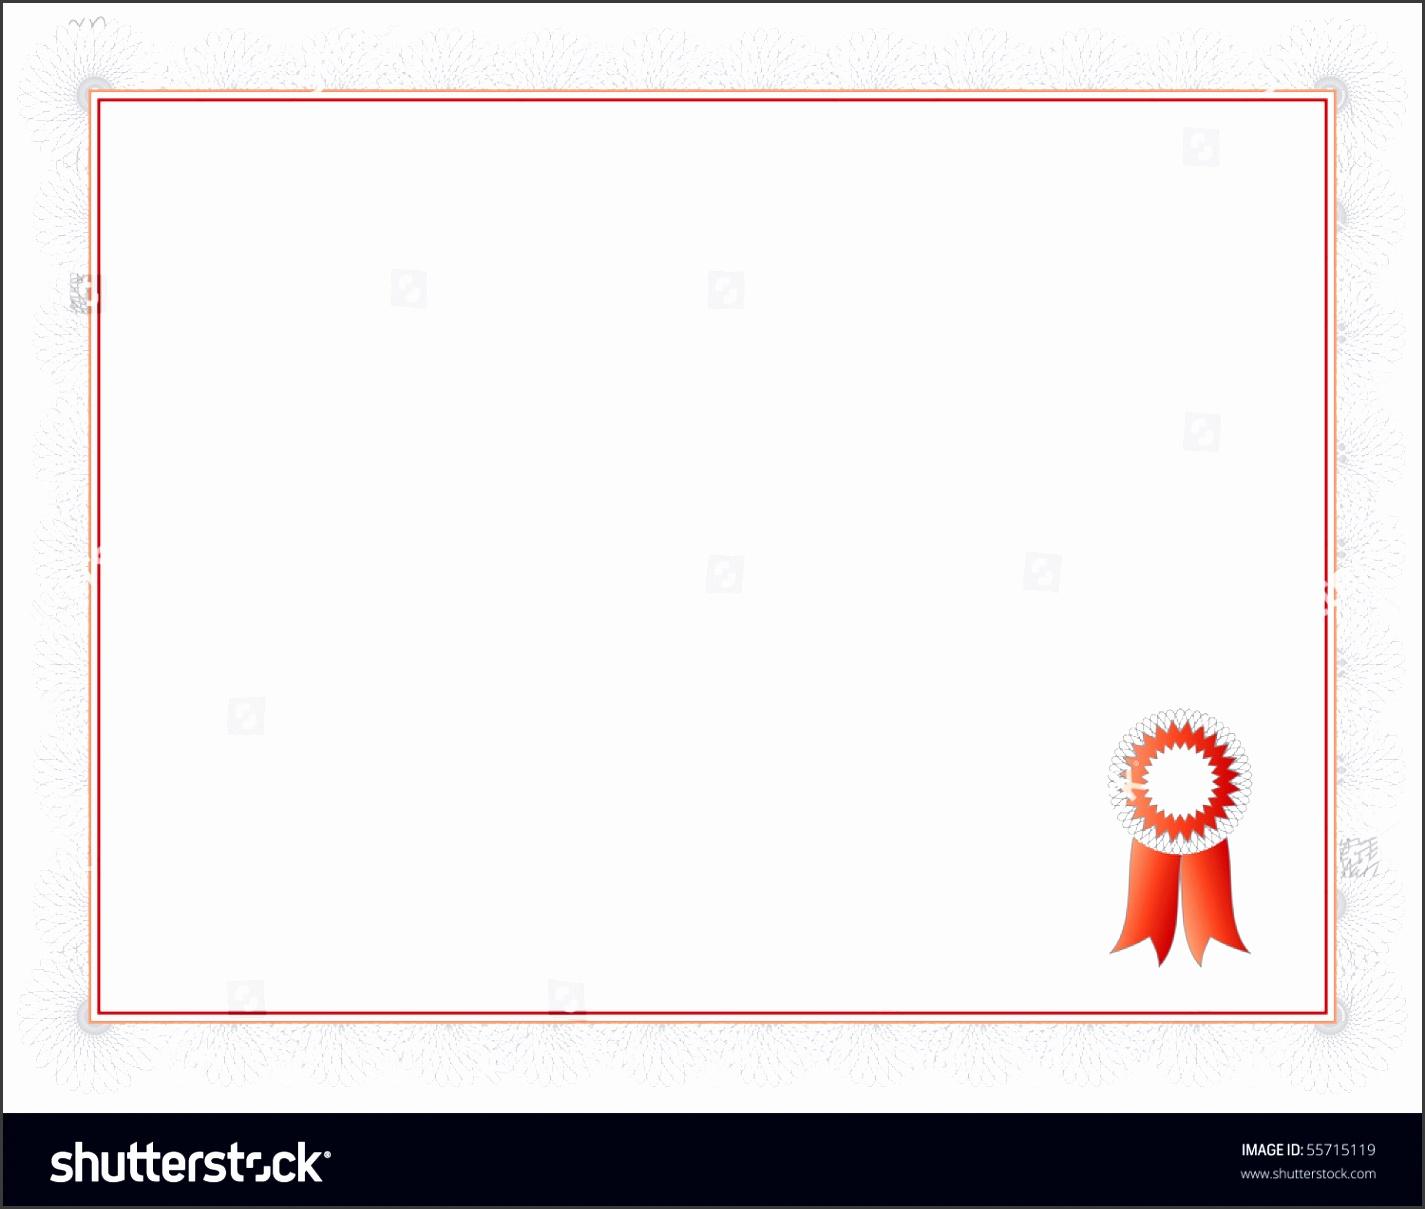 sample certificate of pletion template stock photo certificate of pletion template a vector with sample